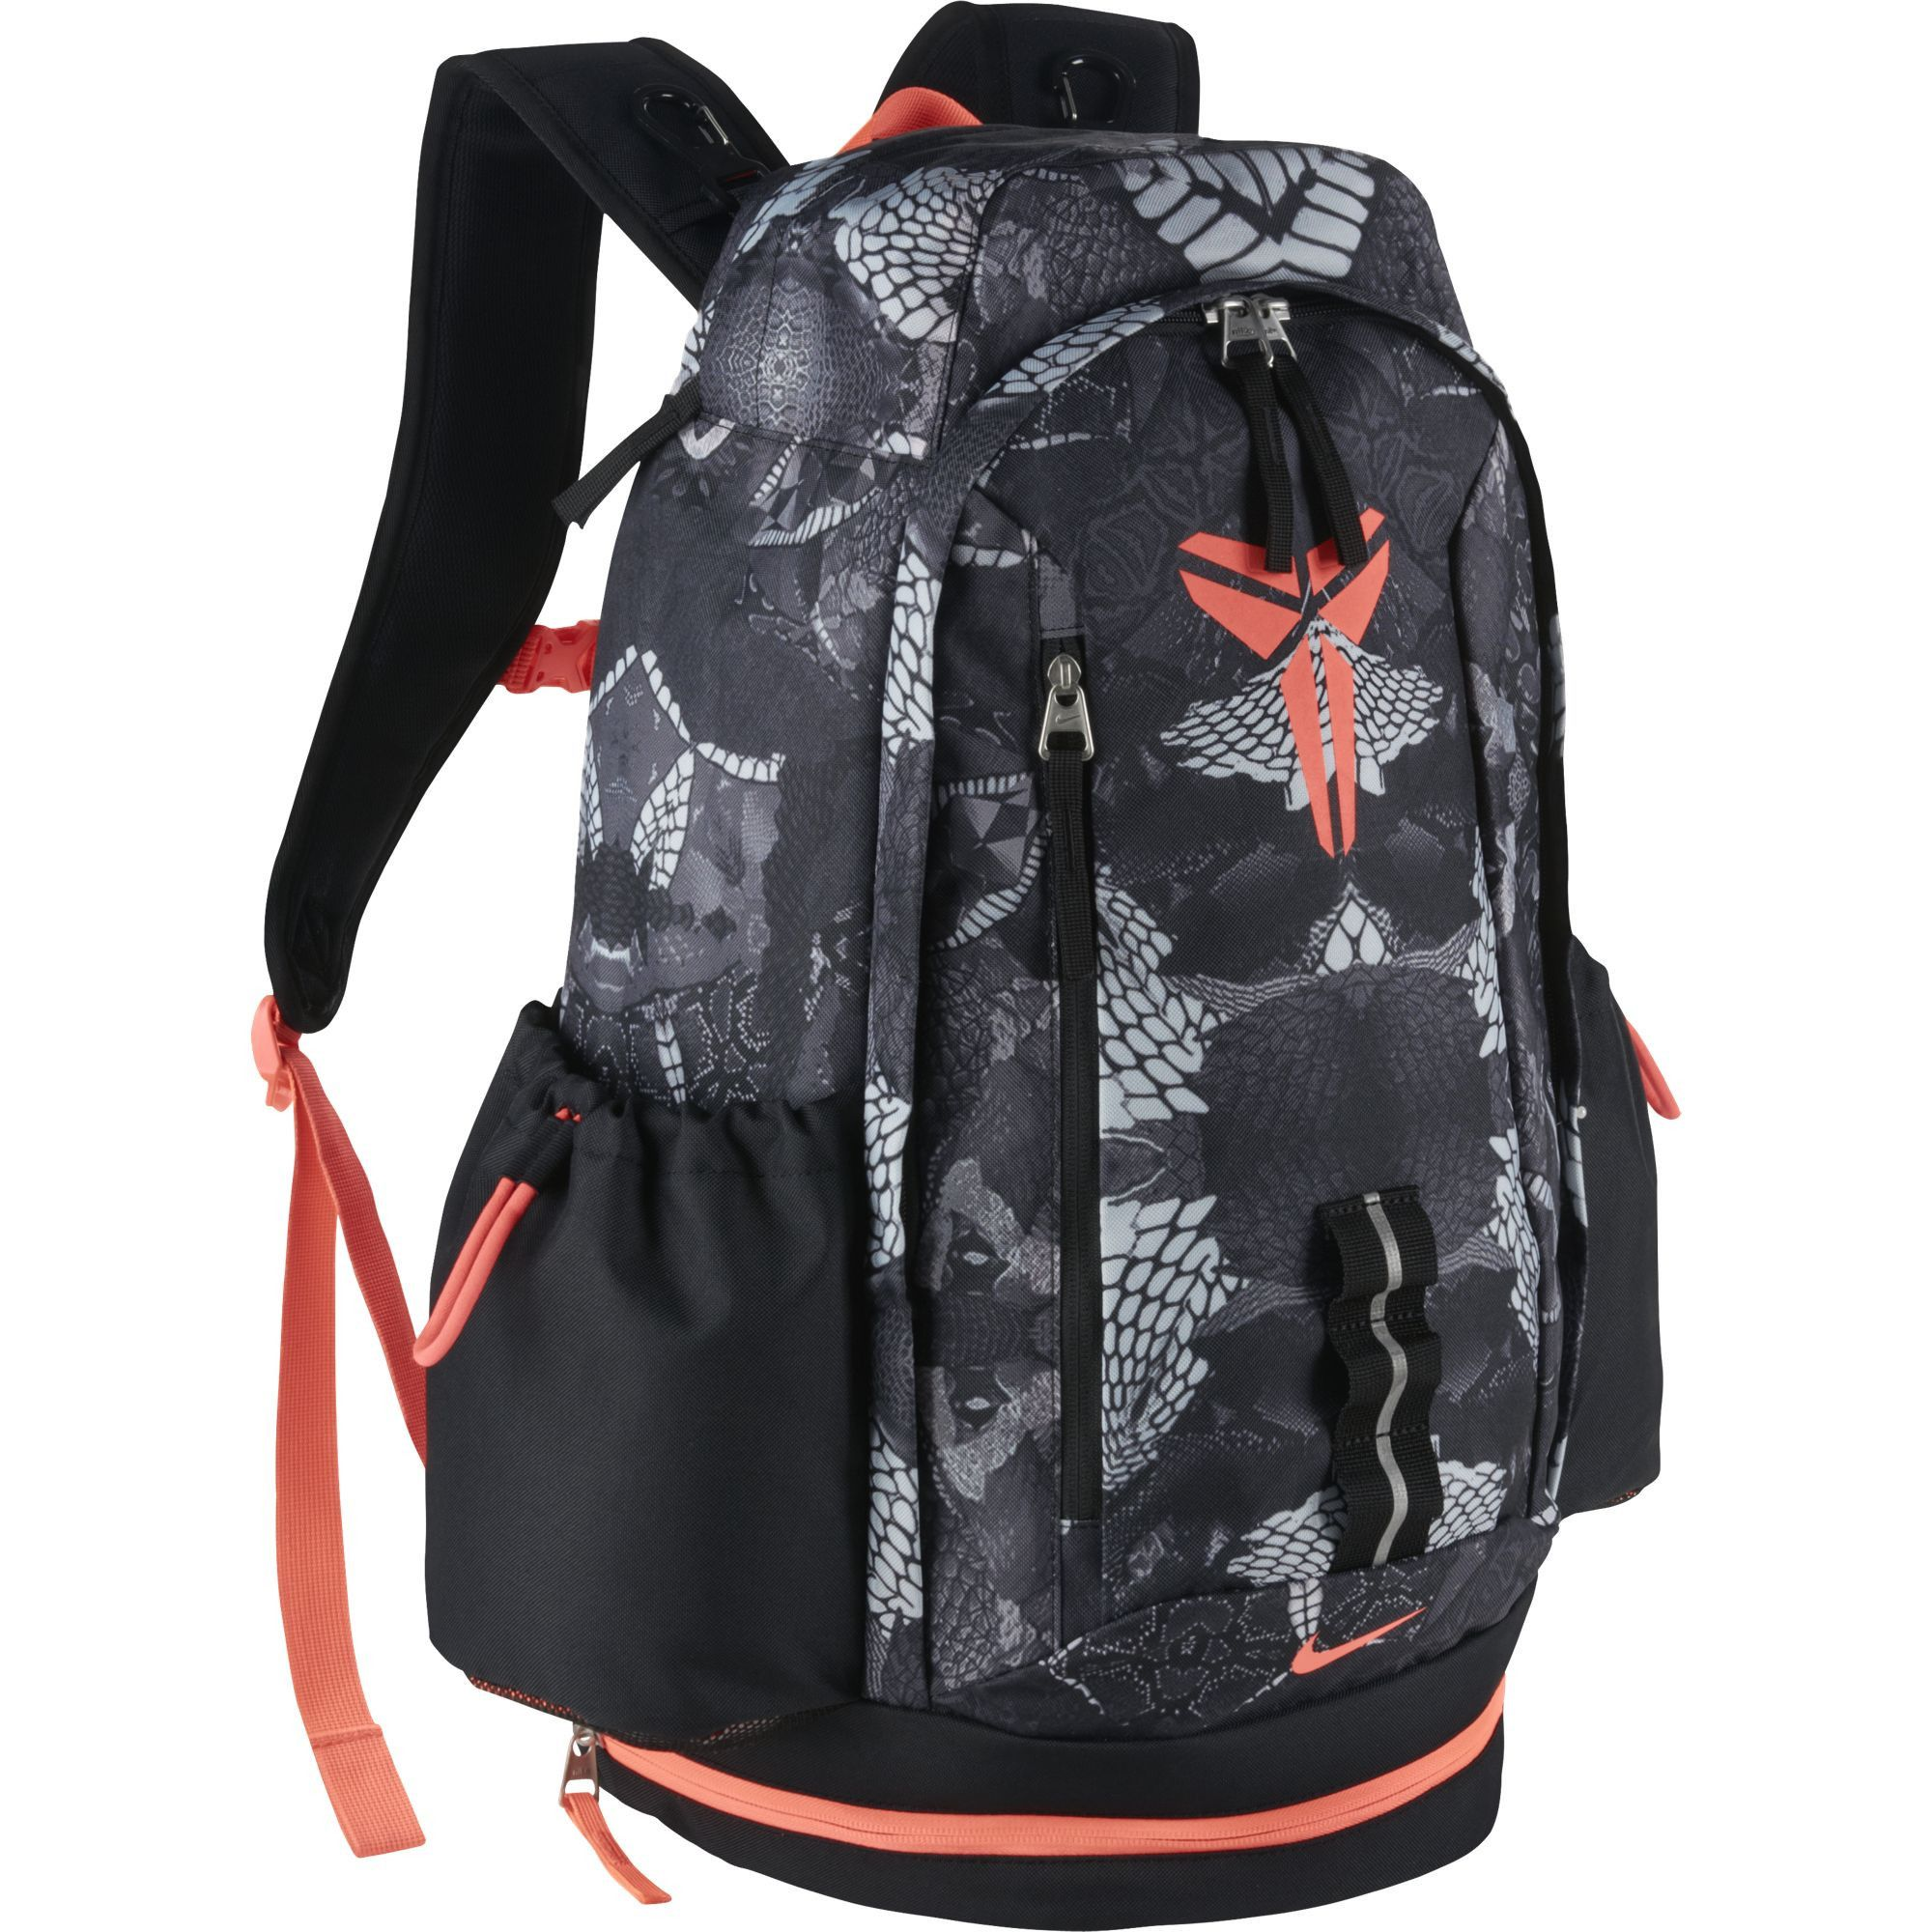 820c893a7de3 Nike.com Nike Max Air Vapor Backpack SKU8317801 kobe backpack amazon New  Nike Kobe Mamba  nike ultimatum ...